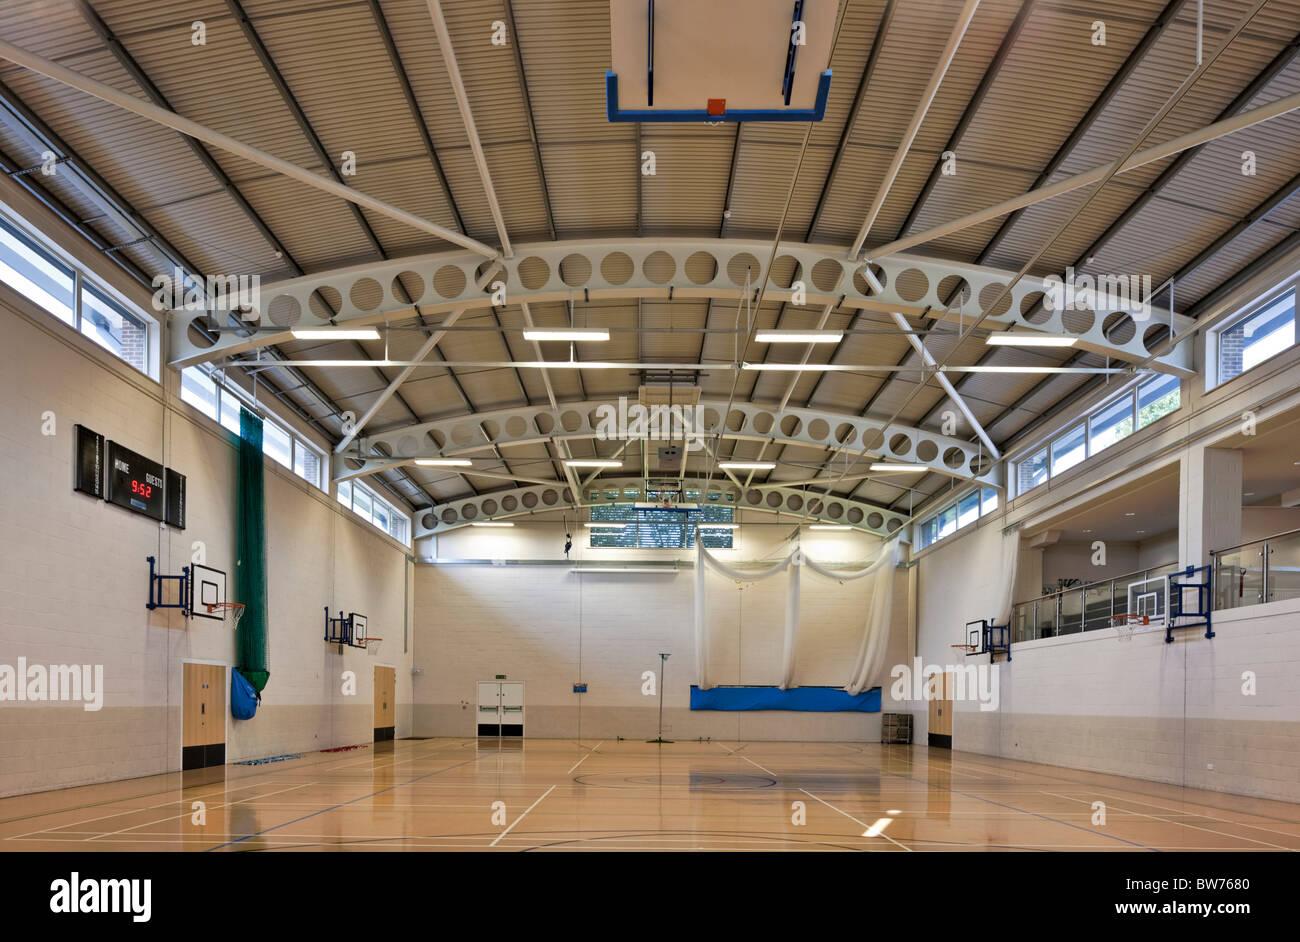 Ibstock luogo School Sports Hall. Immagini Stock